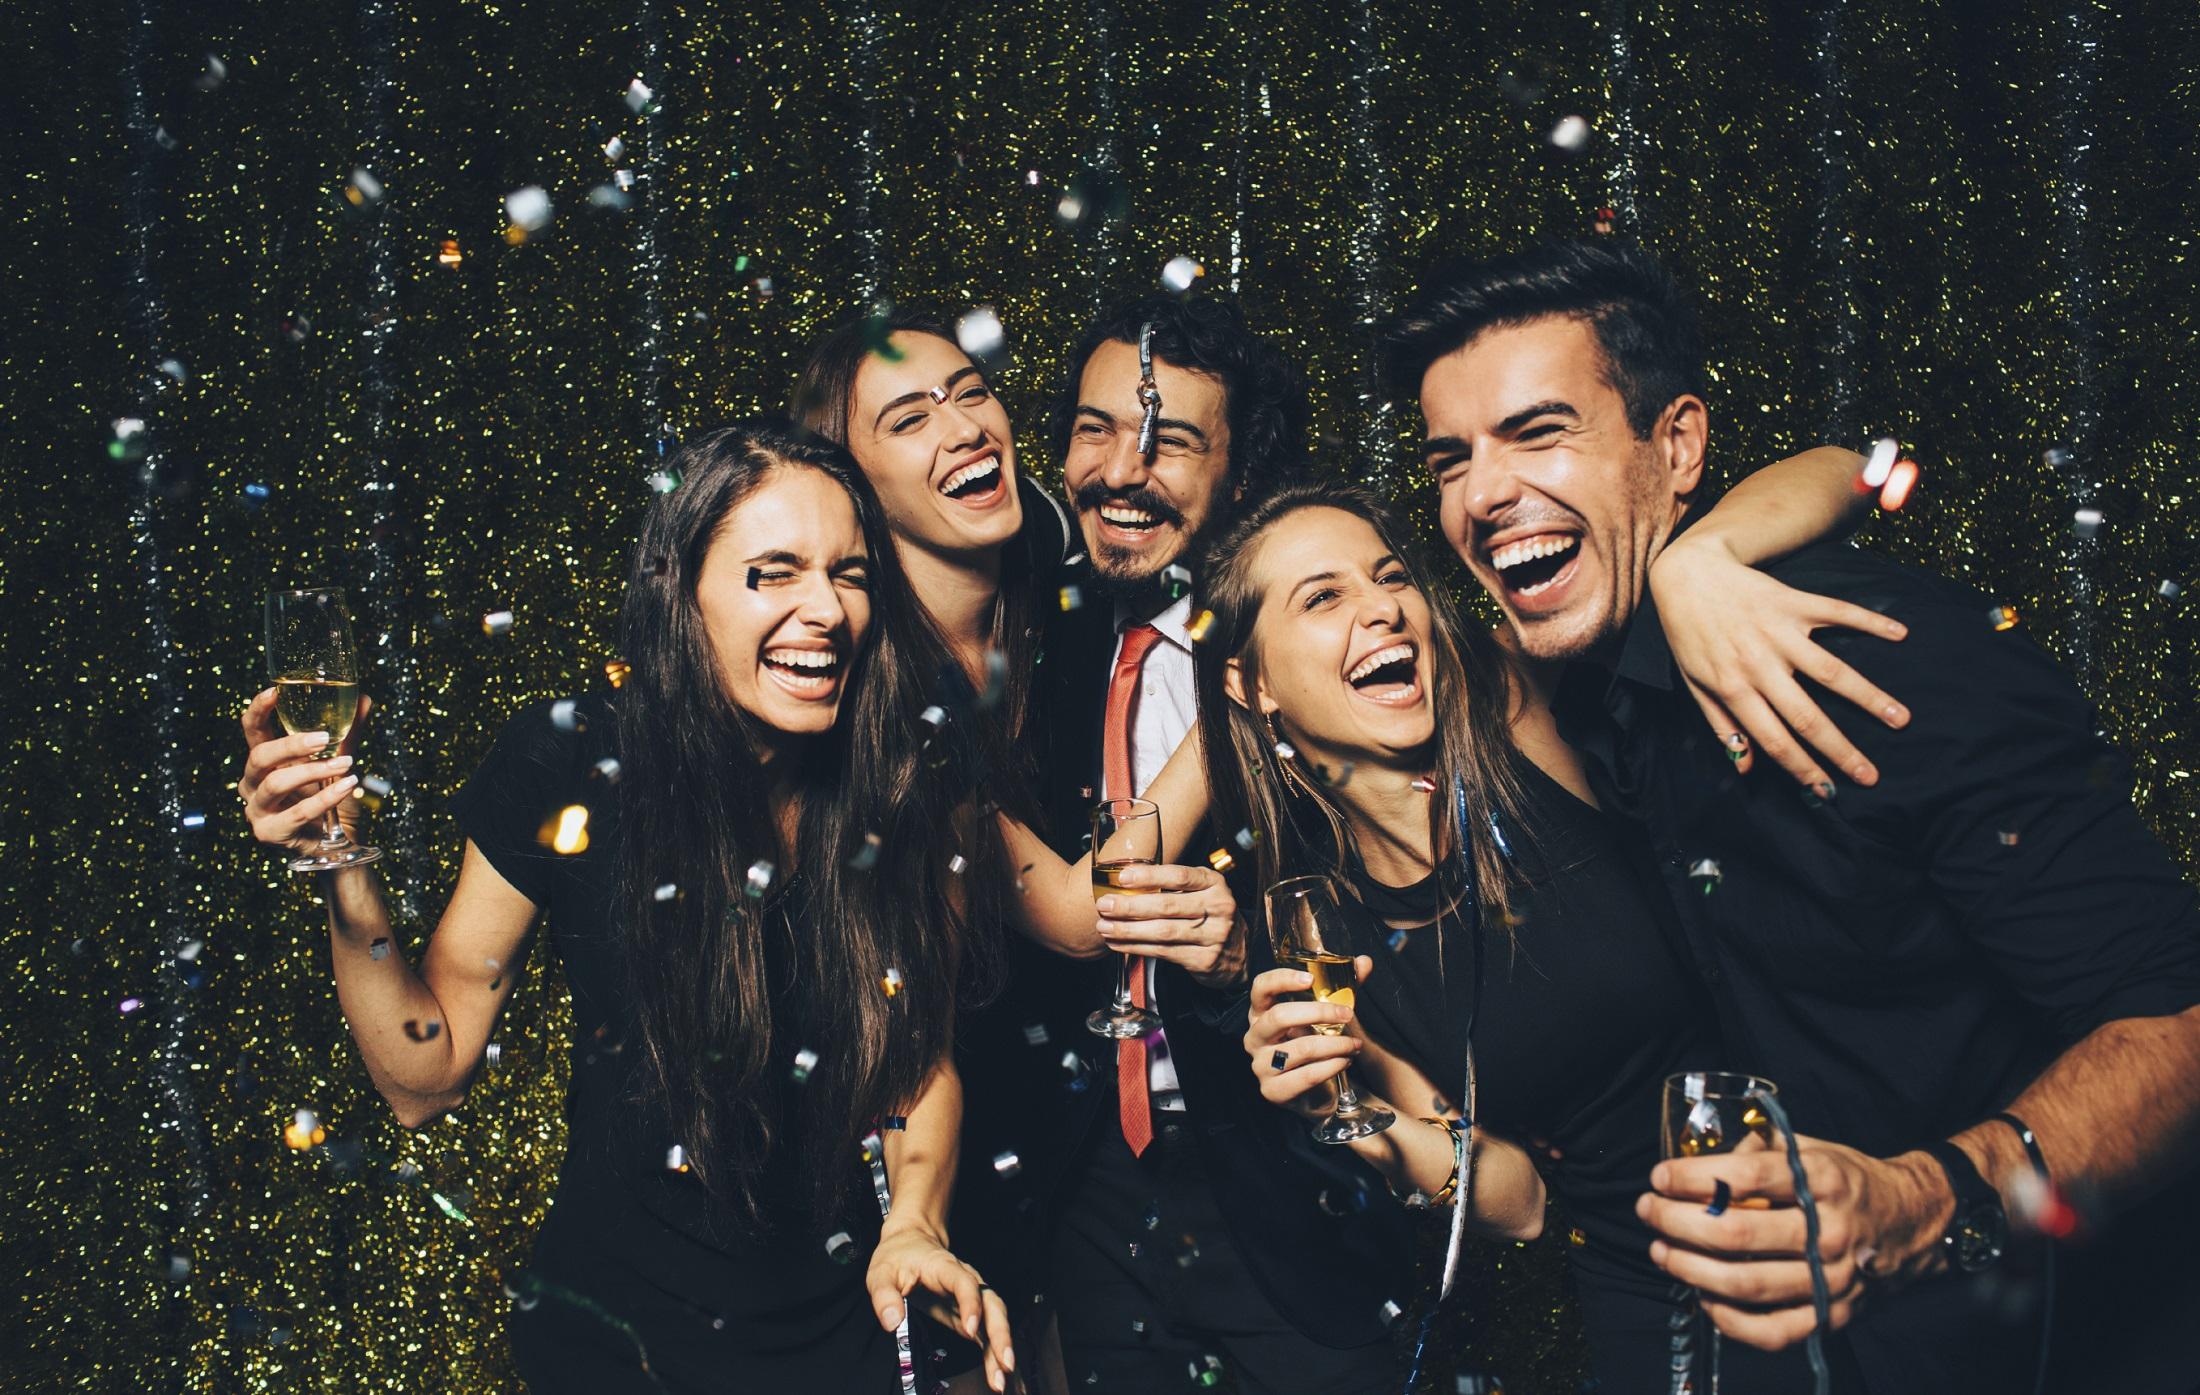 wealthy_friends_celebrating_new_years.jpg